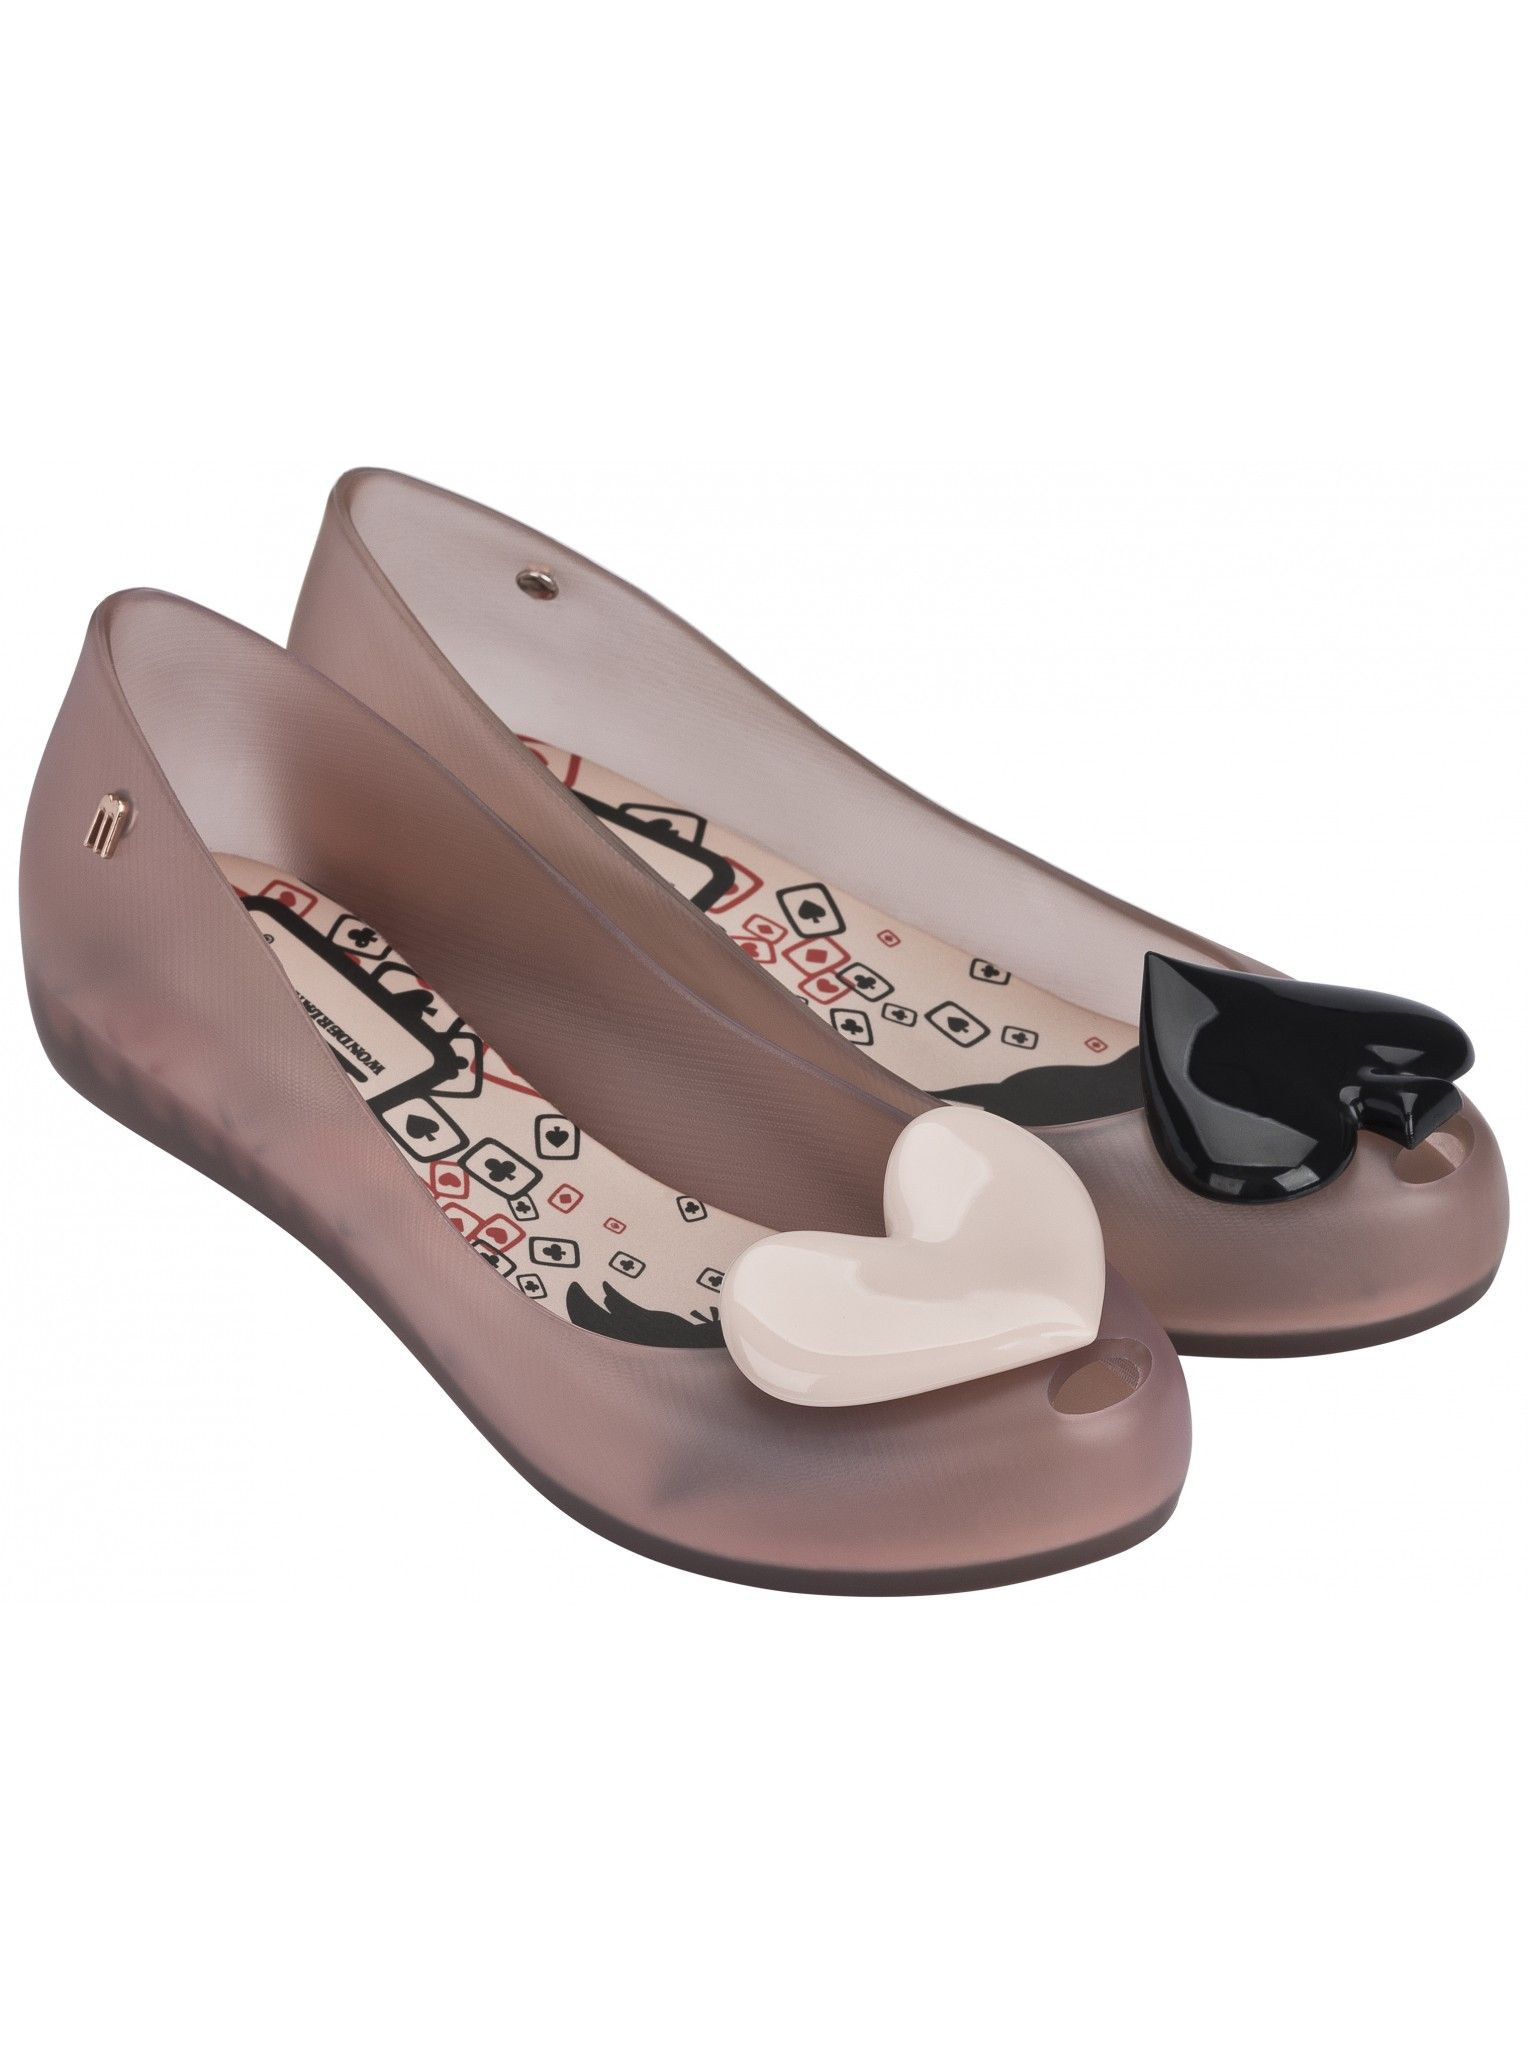 Alice Ultragirl Blush Heart | Alice In Wonderland + Melissa Shoes | NONNON.co.uk